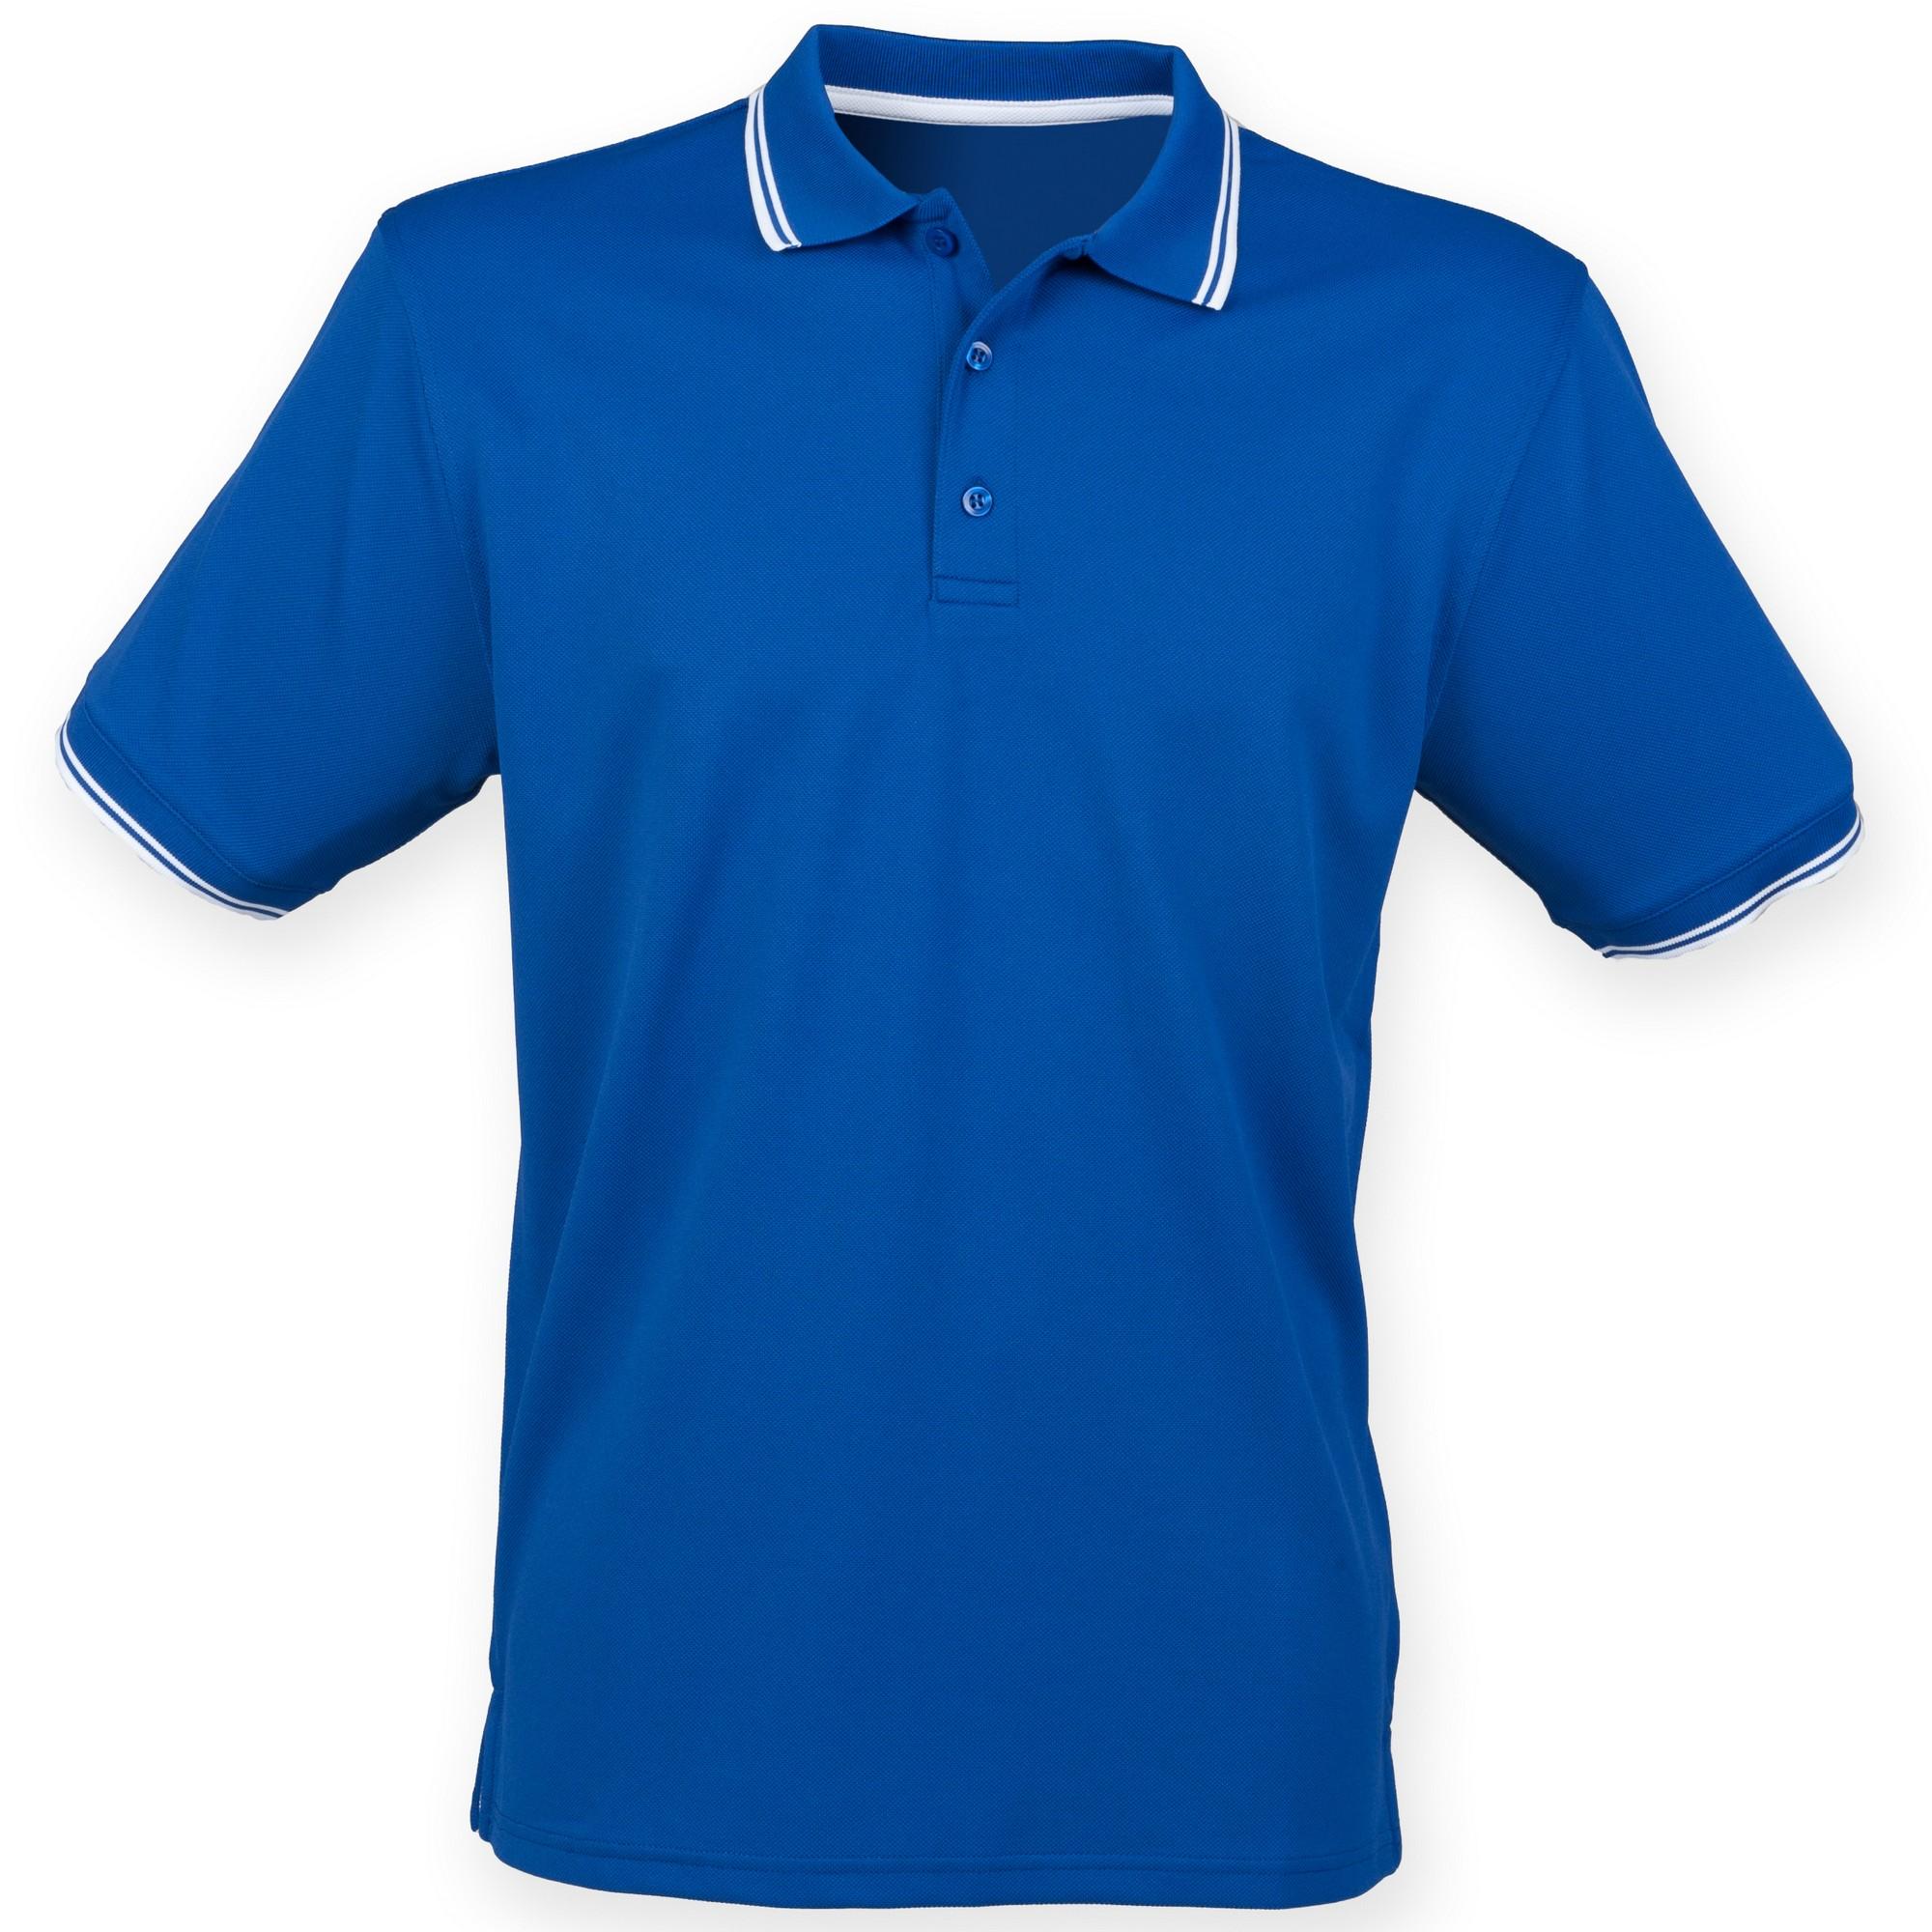 Henbury Mens Coolplus Moisture Wicking Short Sleeve Polo Shirt (3XL) (Royal/White)